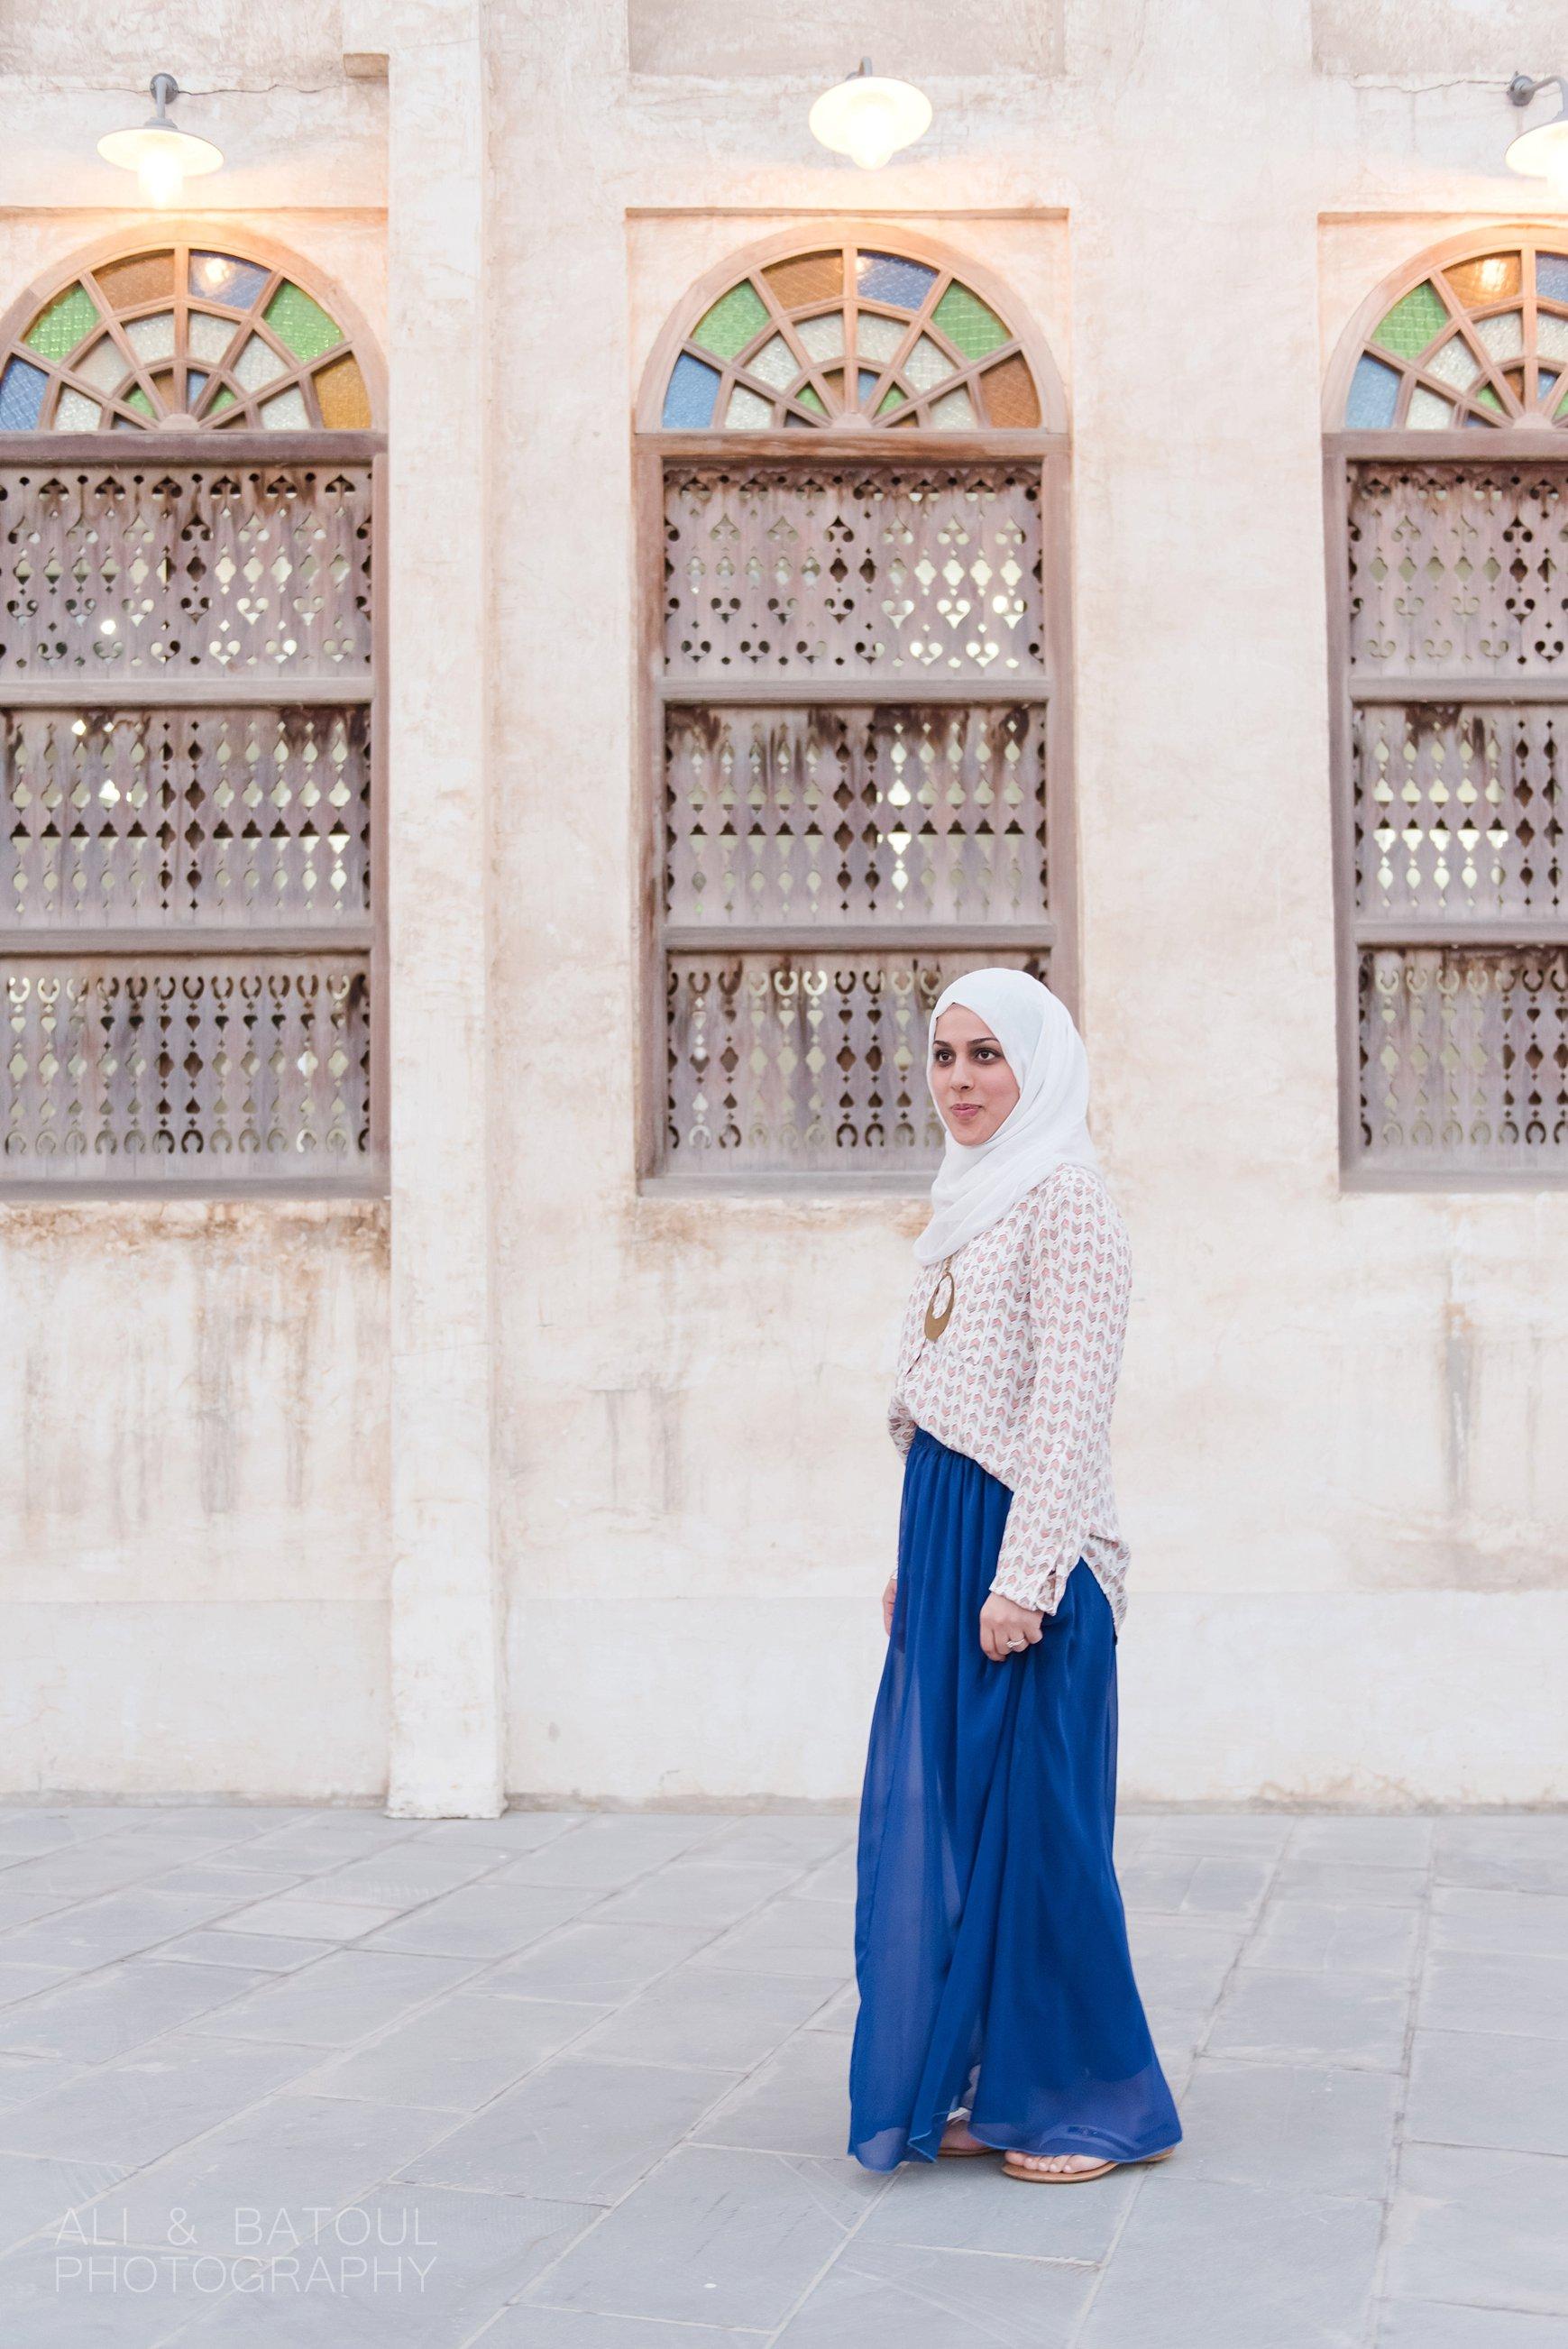 Ali & Batoul Photography - Doha Travel Photography_0024.jpg